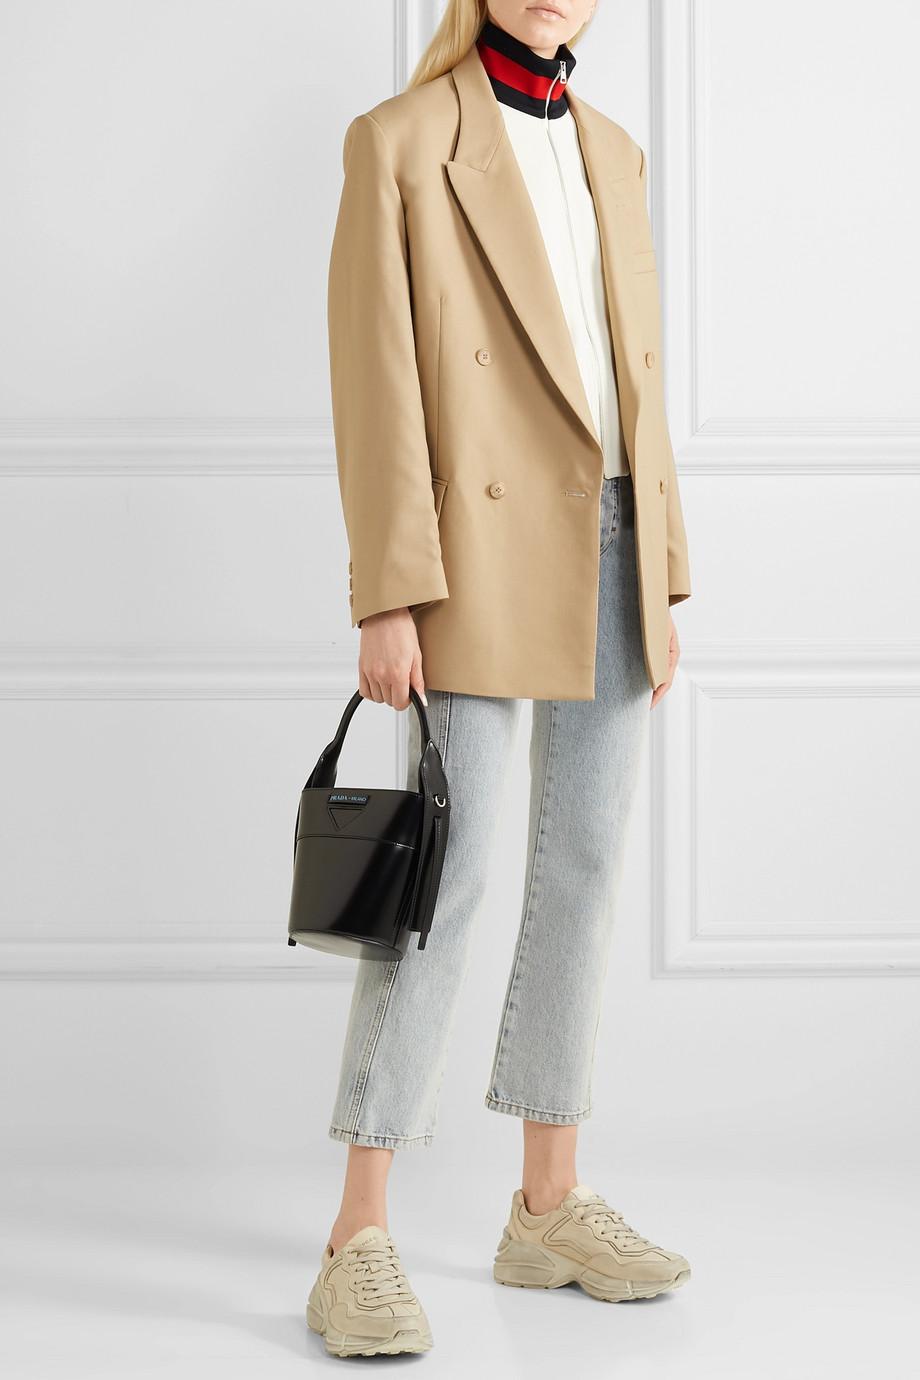 Gucci Striped twill bomber jacket